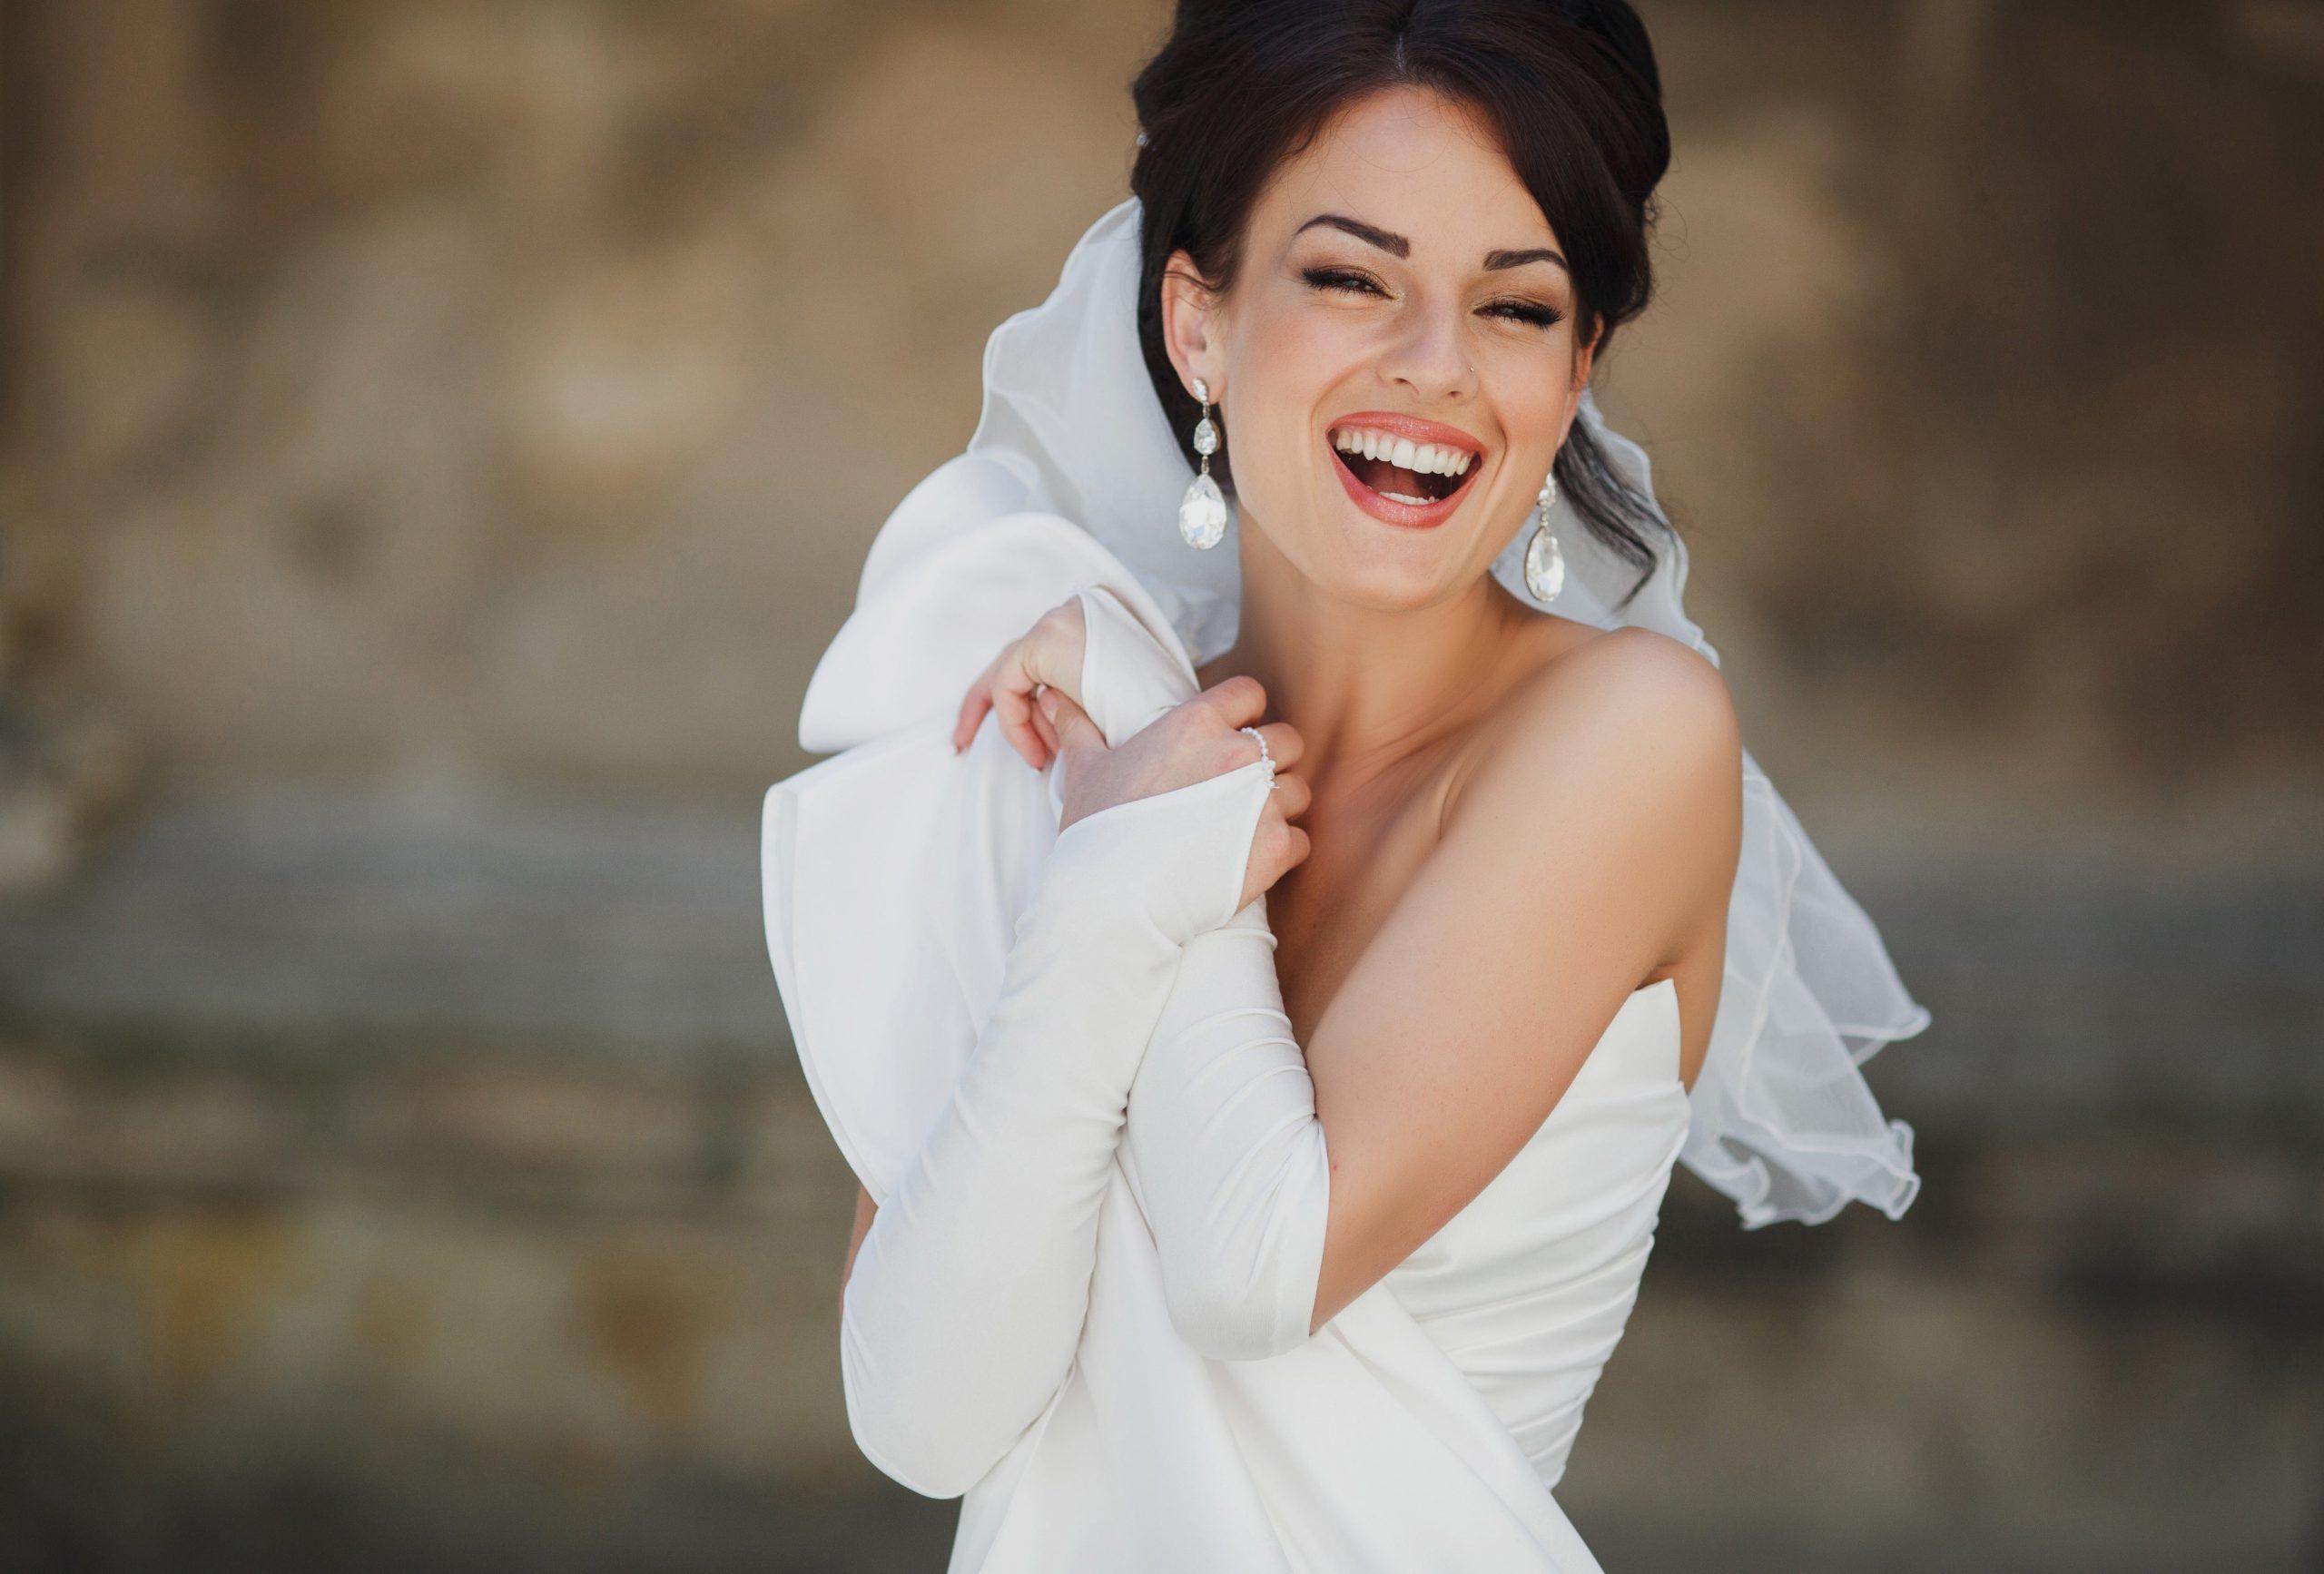 Wedding Smiles Makeover: Το ομορφότερο χαμόγελο για το γάμο σου